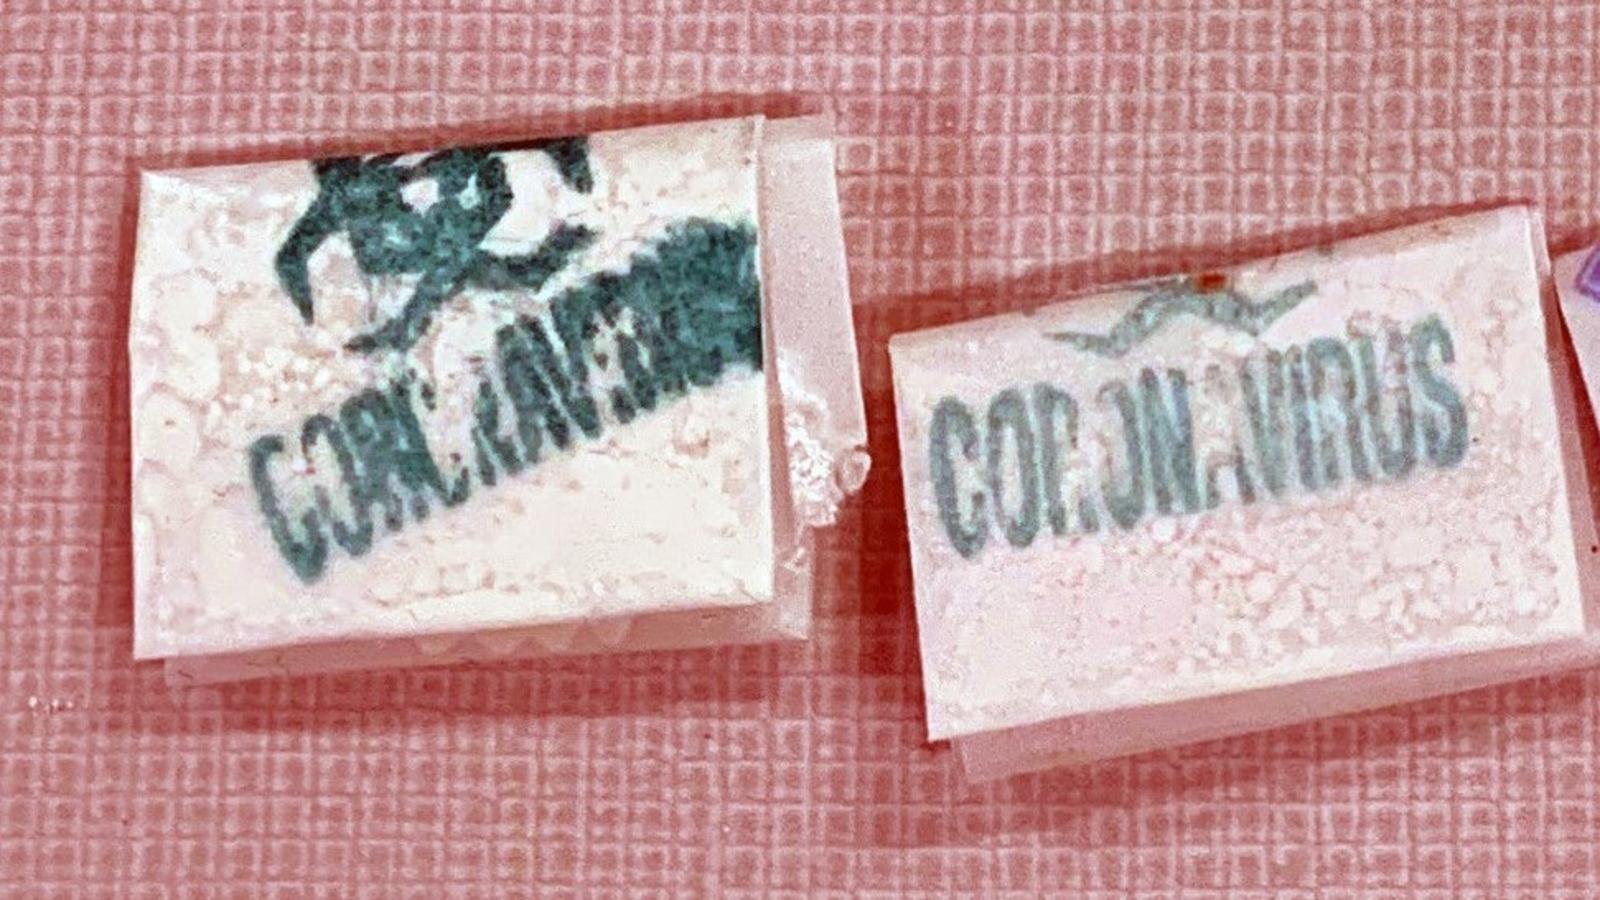 Coronavirus US: DEA seizes $1M worth of heroin, Fentanyl labeled ' coronavirus' bio-hazard, 'Black Mamba' in Bronx drug bust - ABC11 Raleigh-Durham